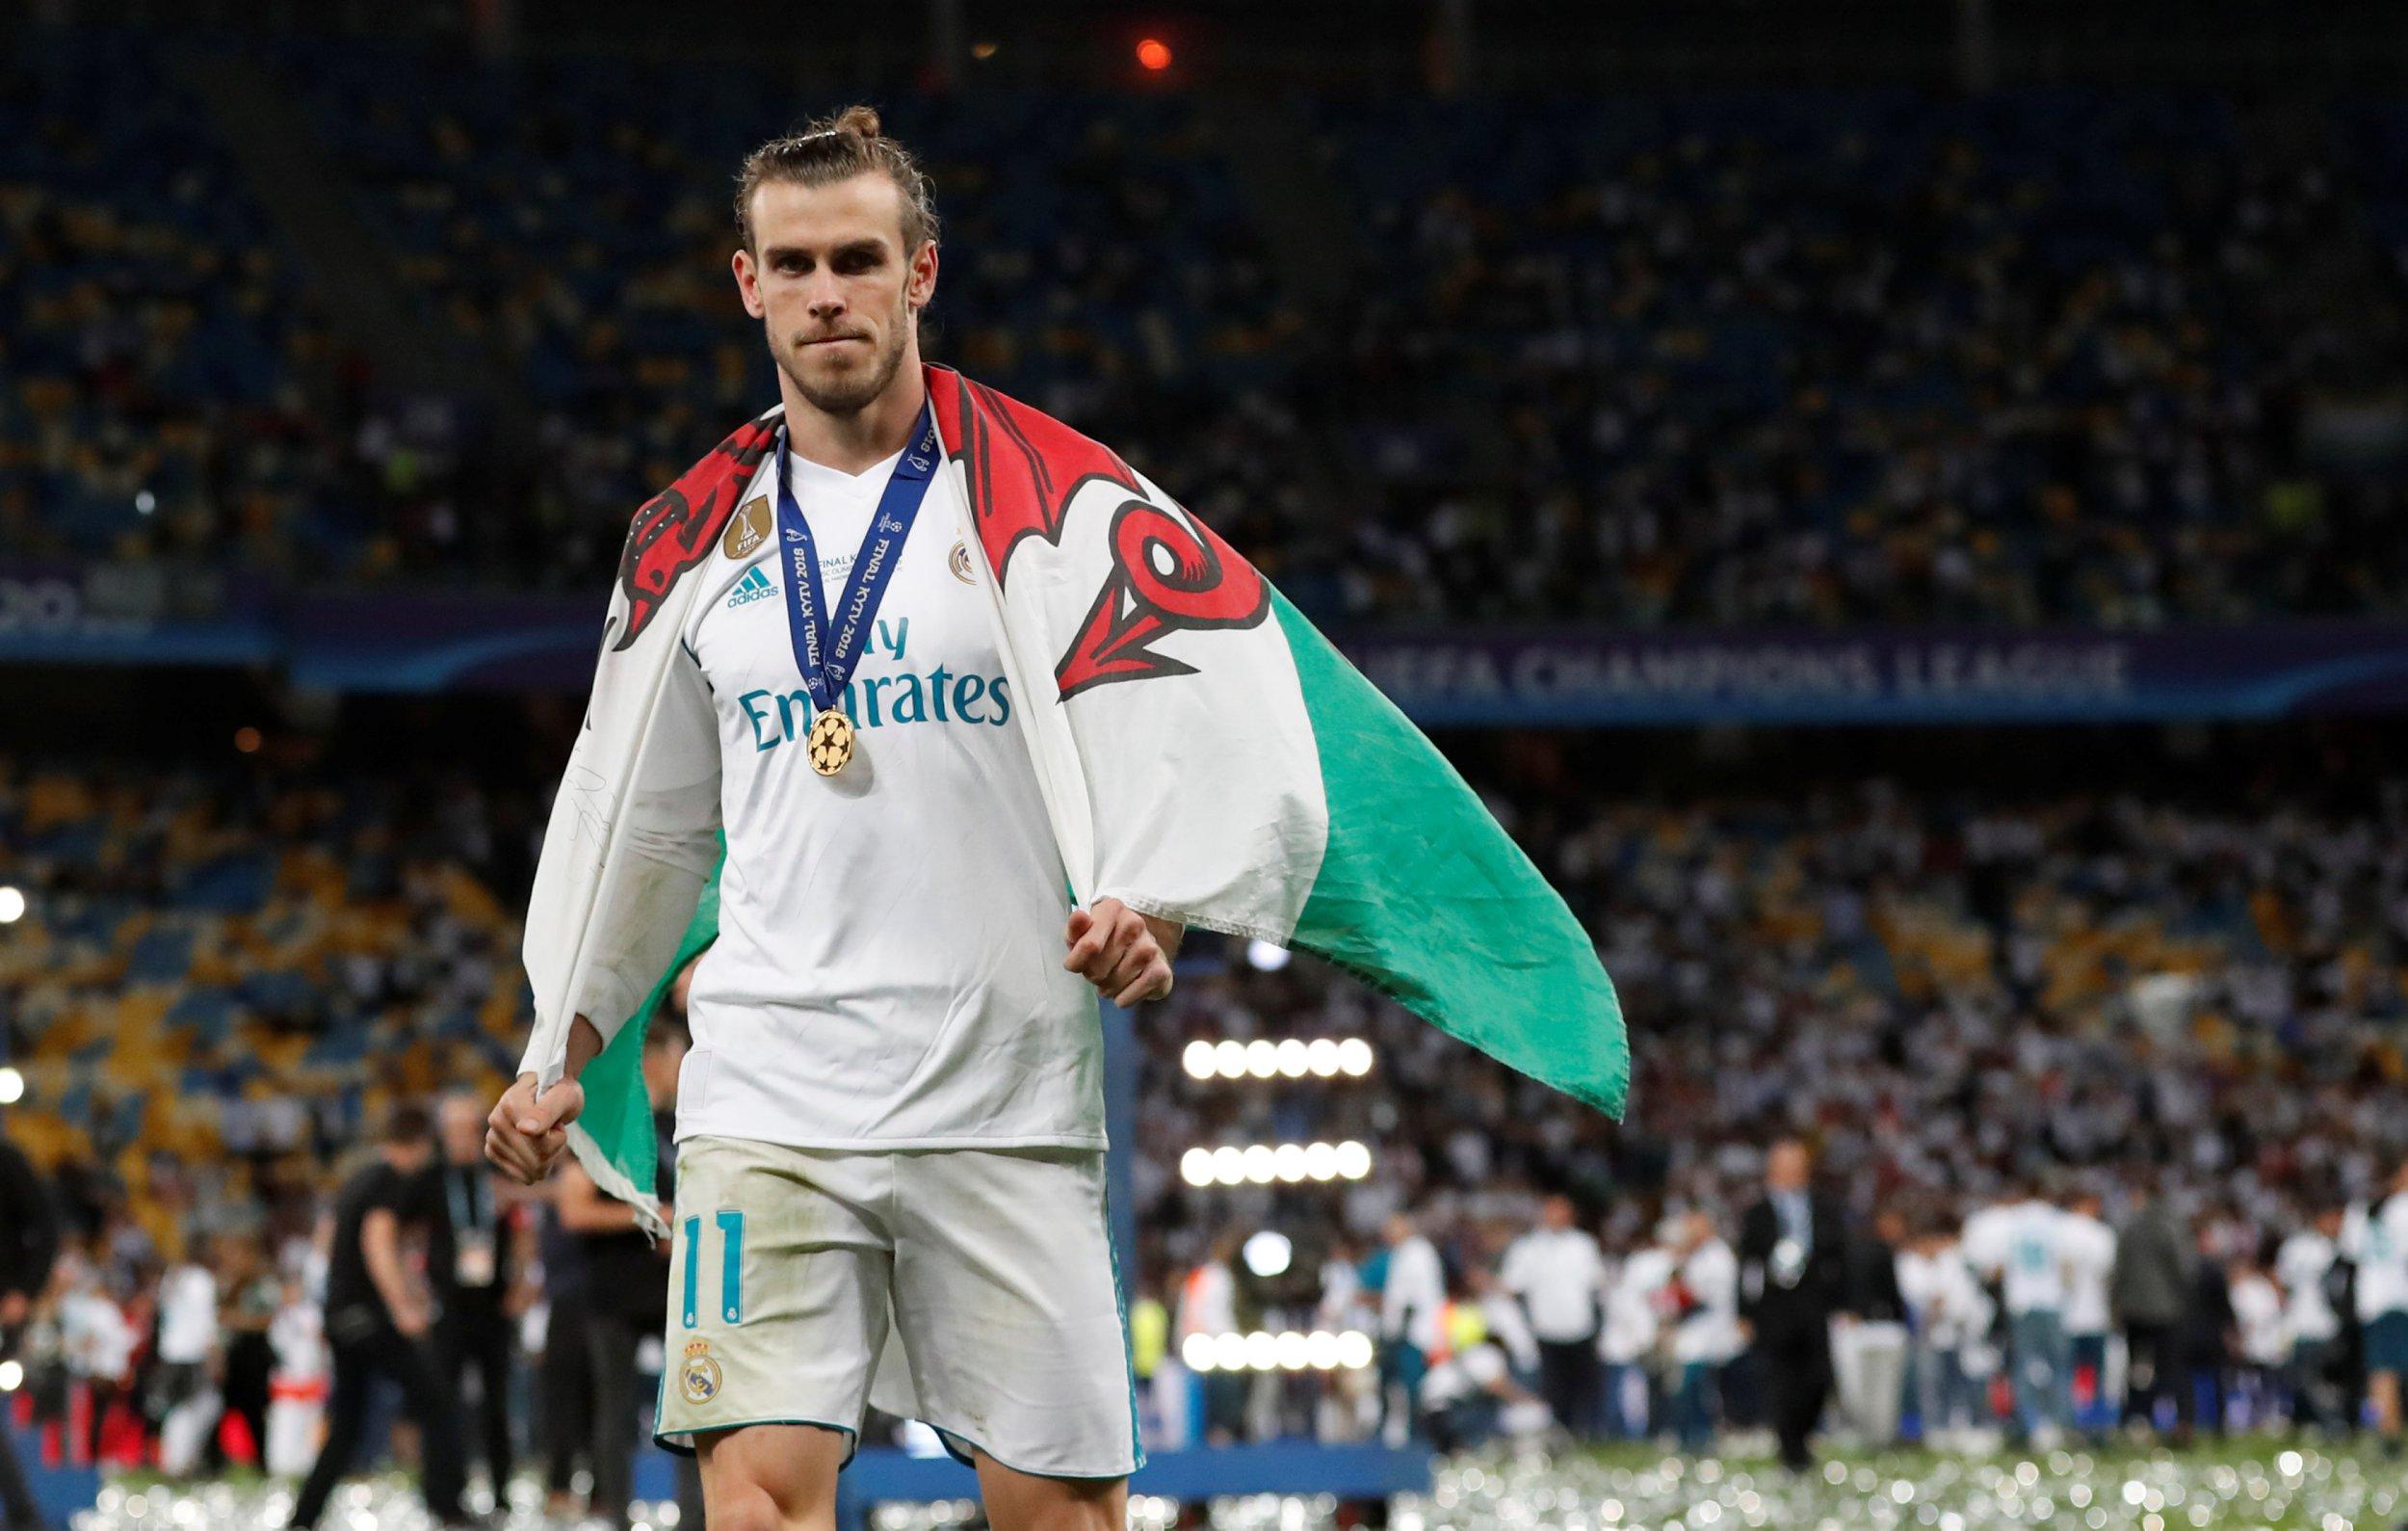 Gareth Bale preferred to talk to Liverpool's Adam Lallana than celebrate with team-mates in Kiev